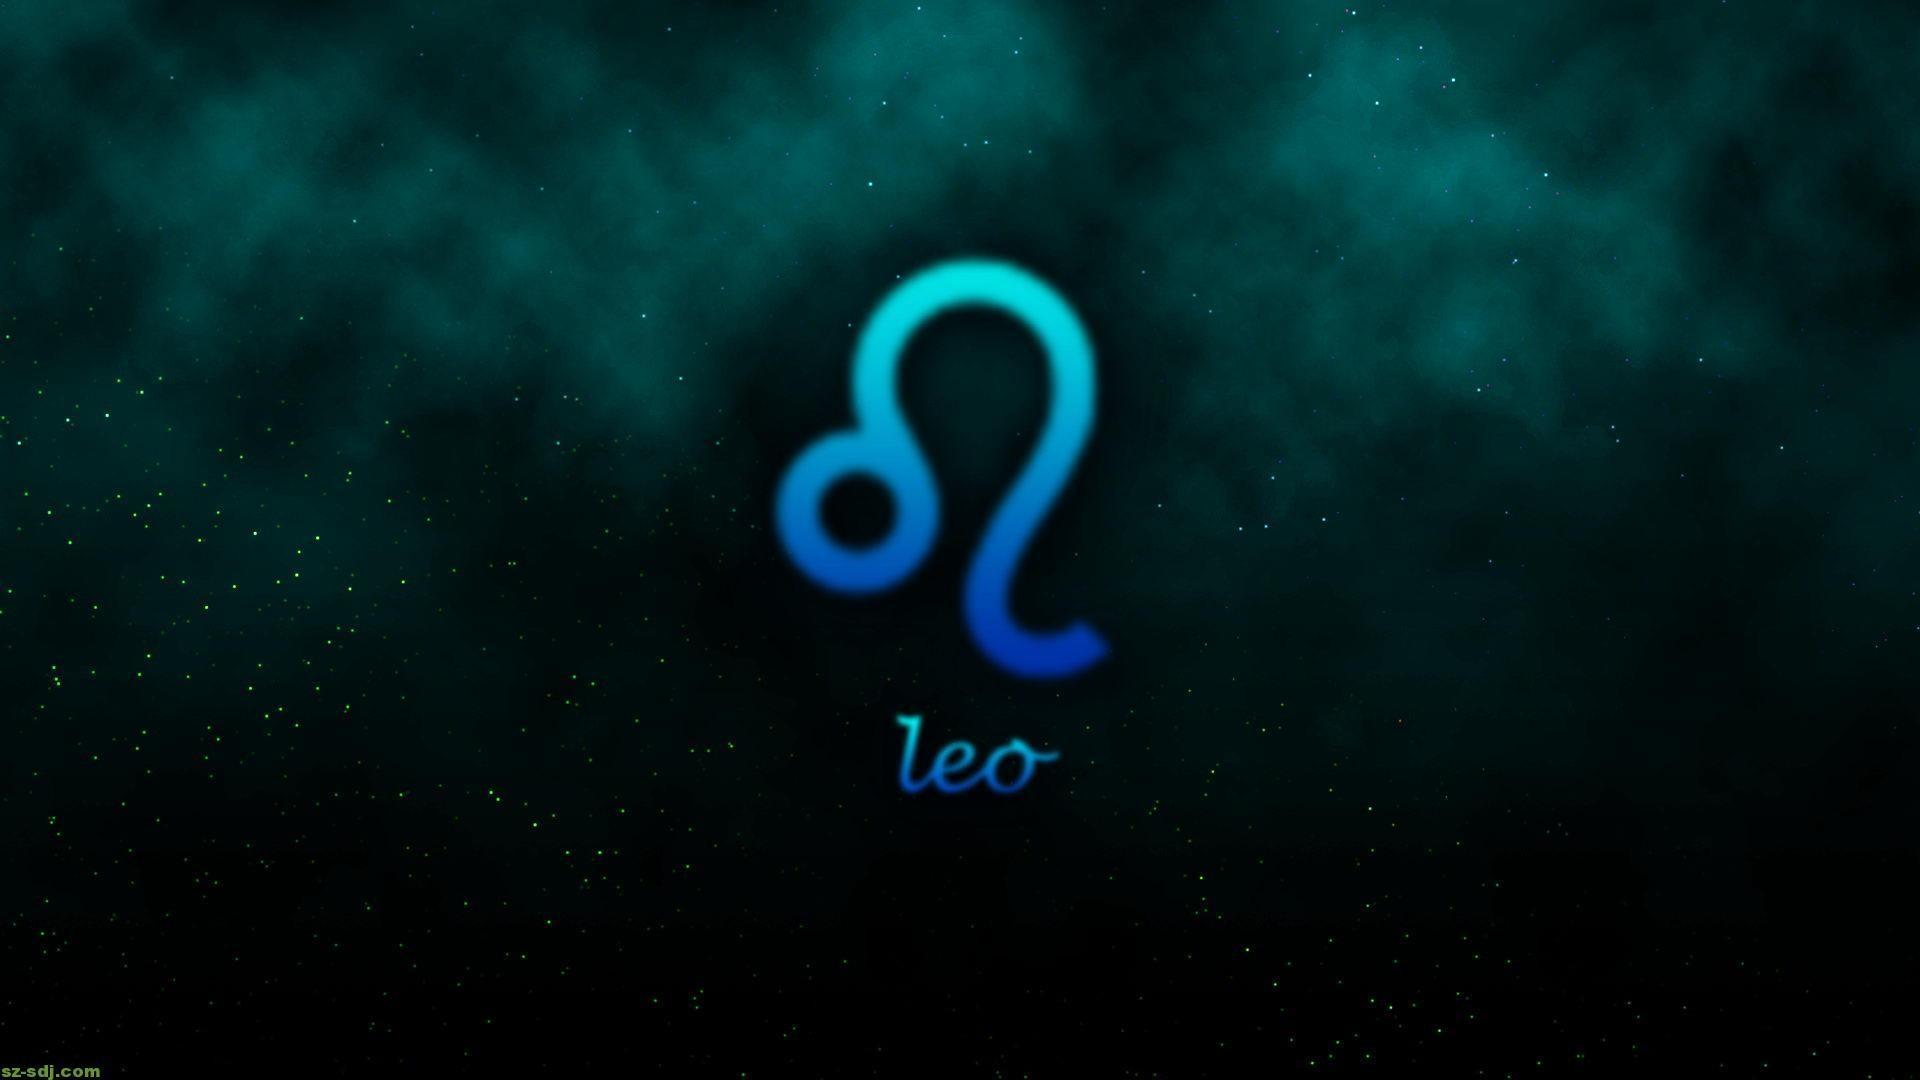 Leo Wallpaper 77 Images